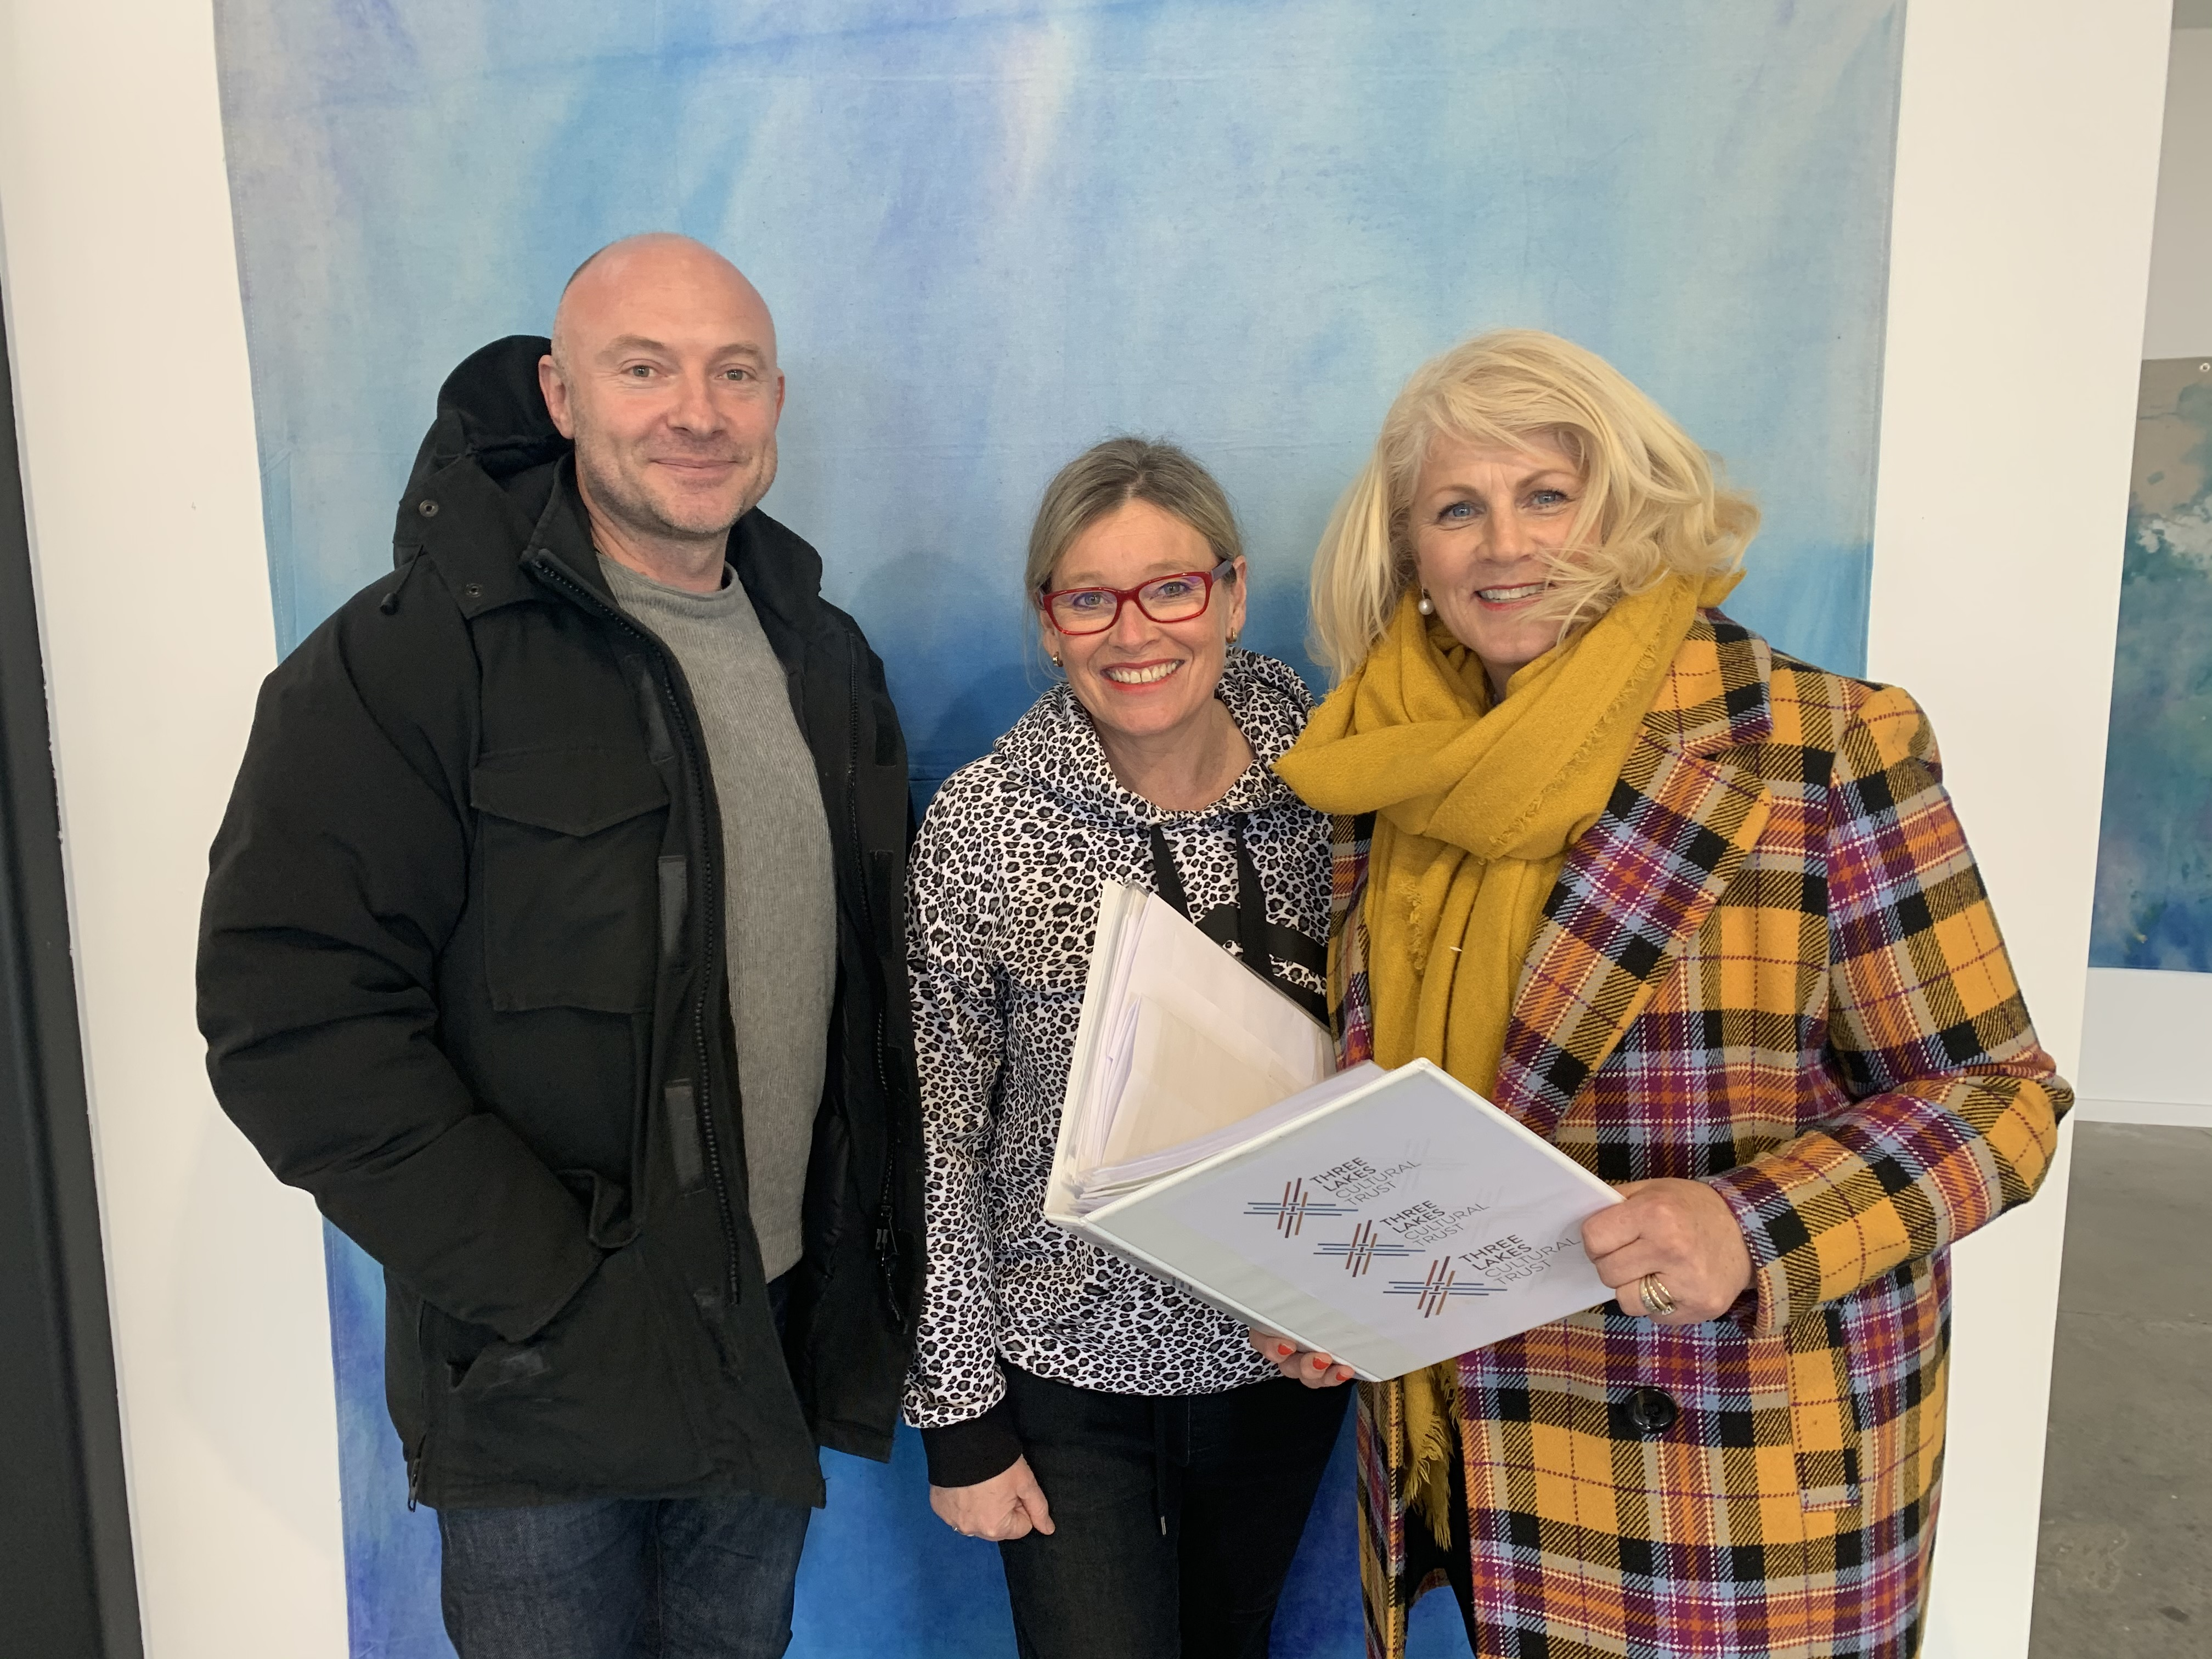 Local artists announced for RenewArt community showcase